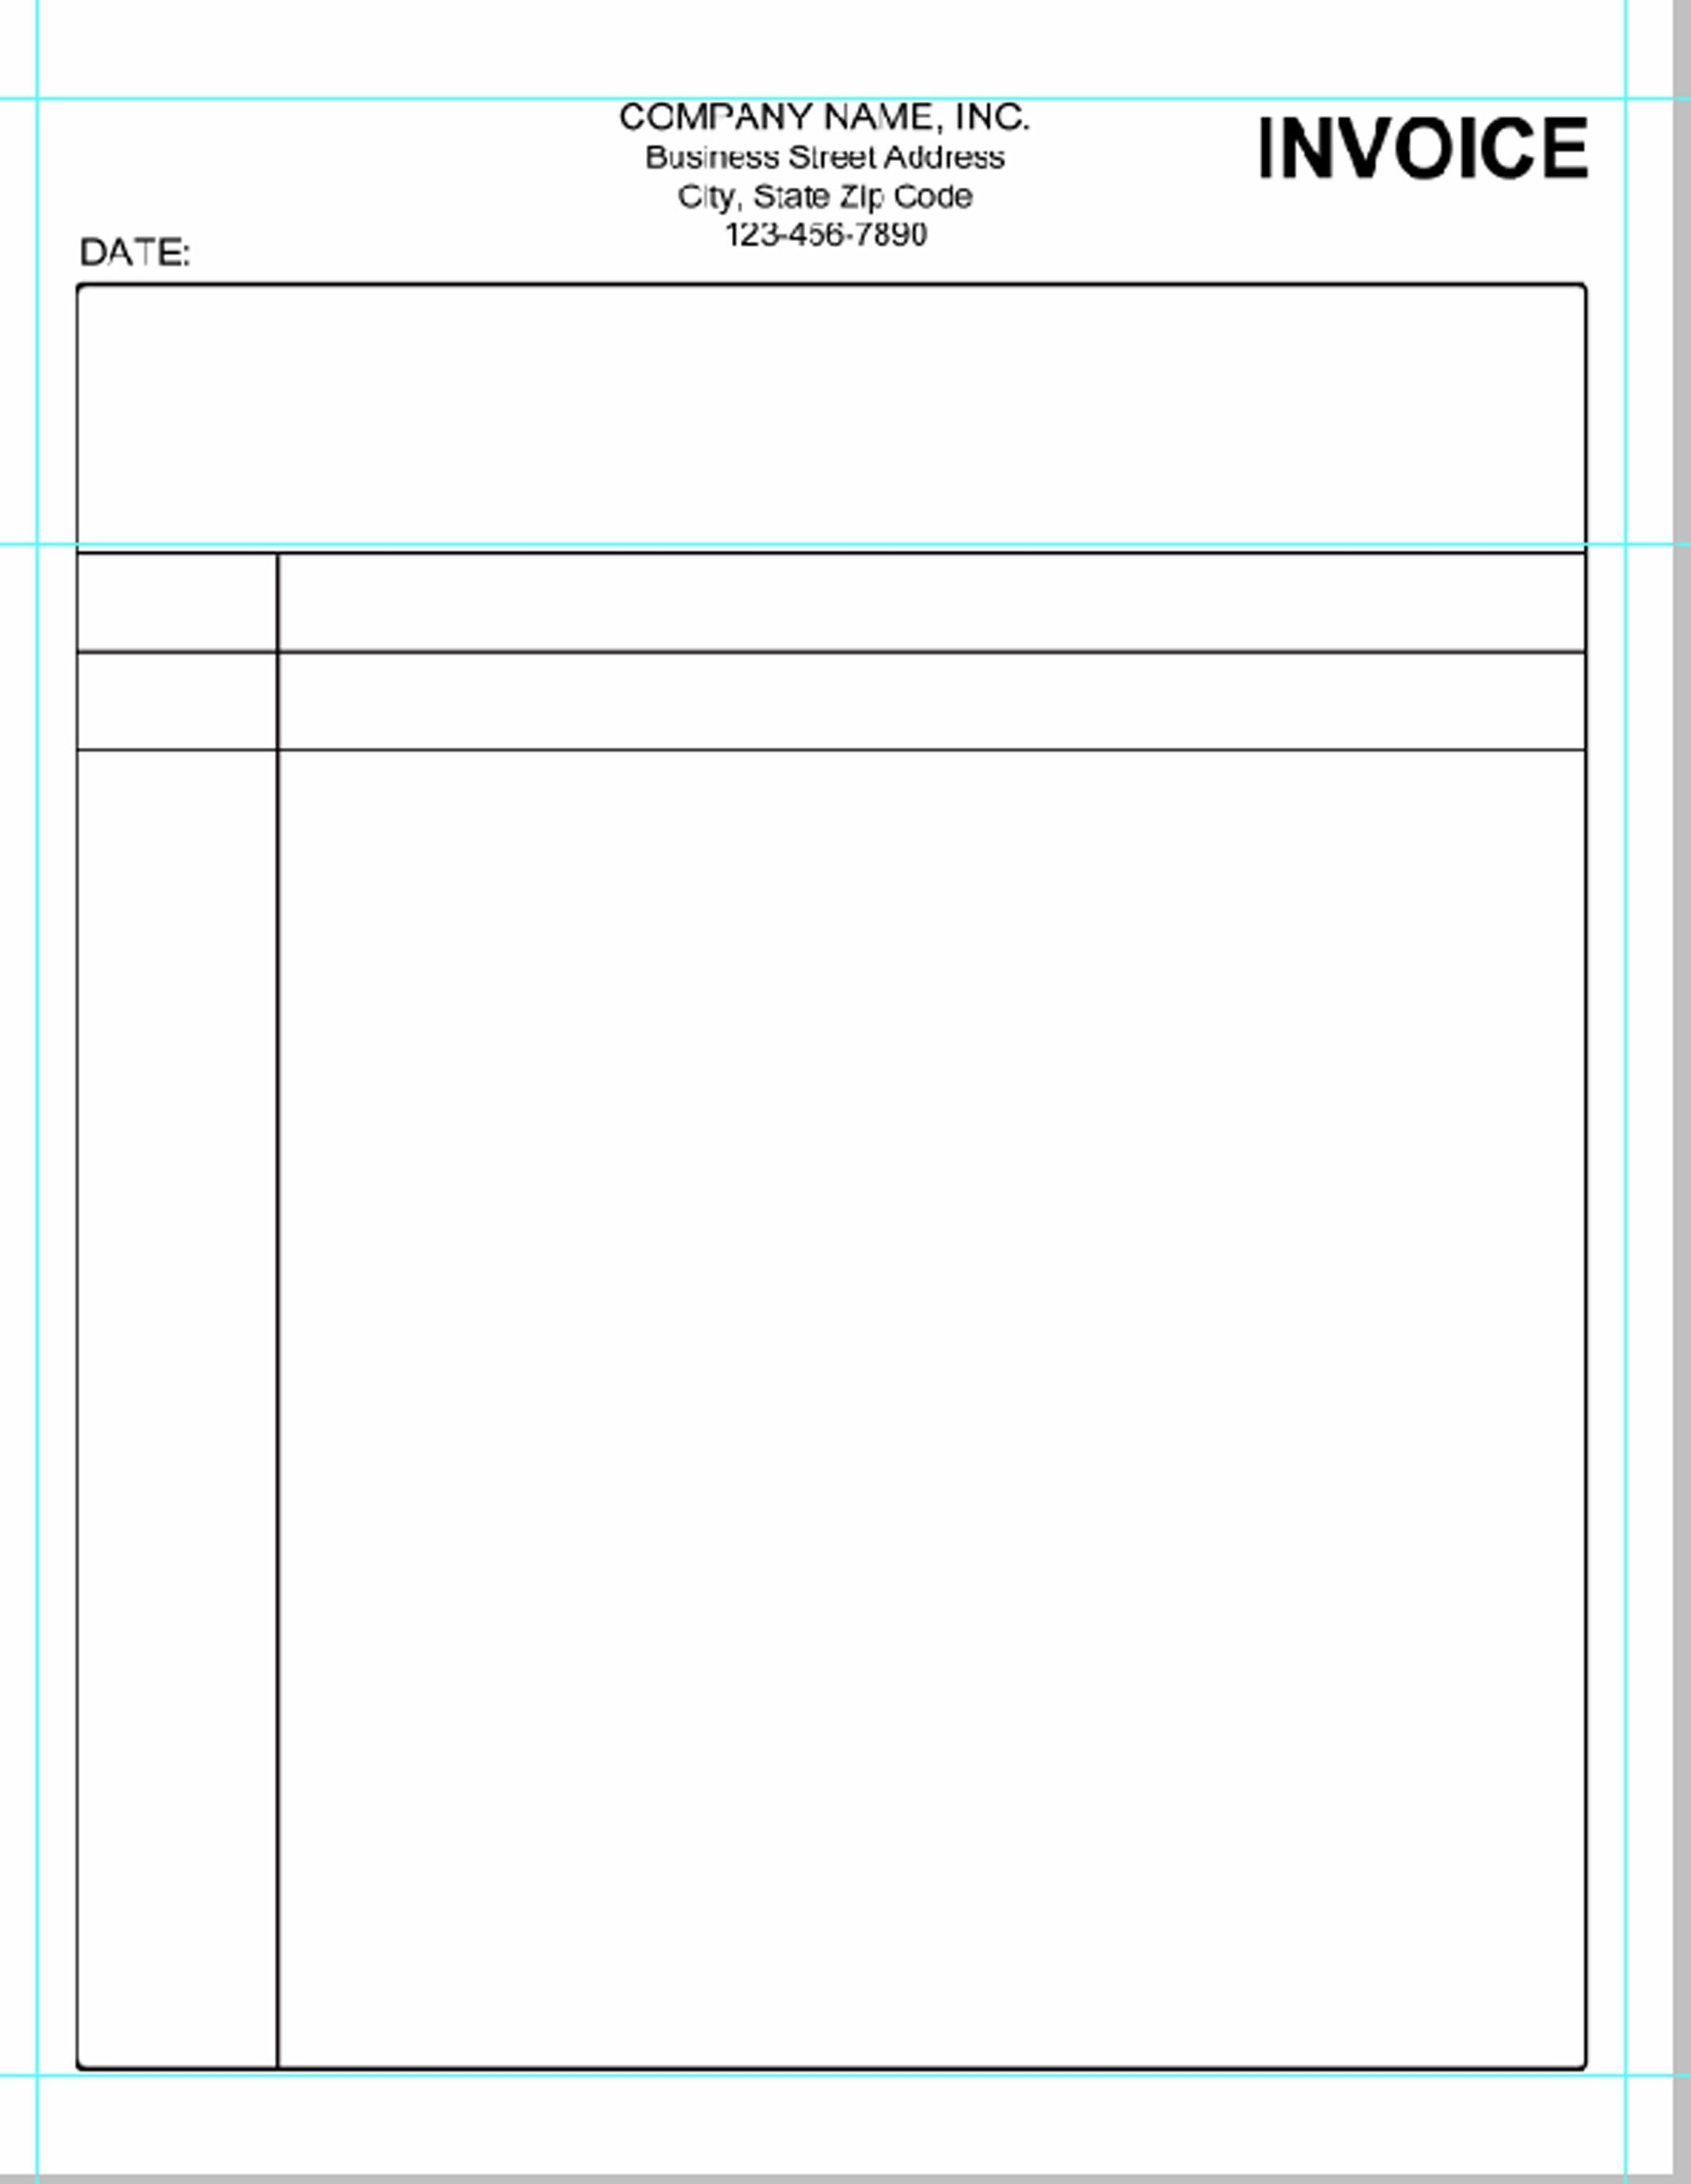 Blank Invoice Template Microsoft Word Invoice Template Free Simple Invoice Template